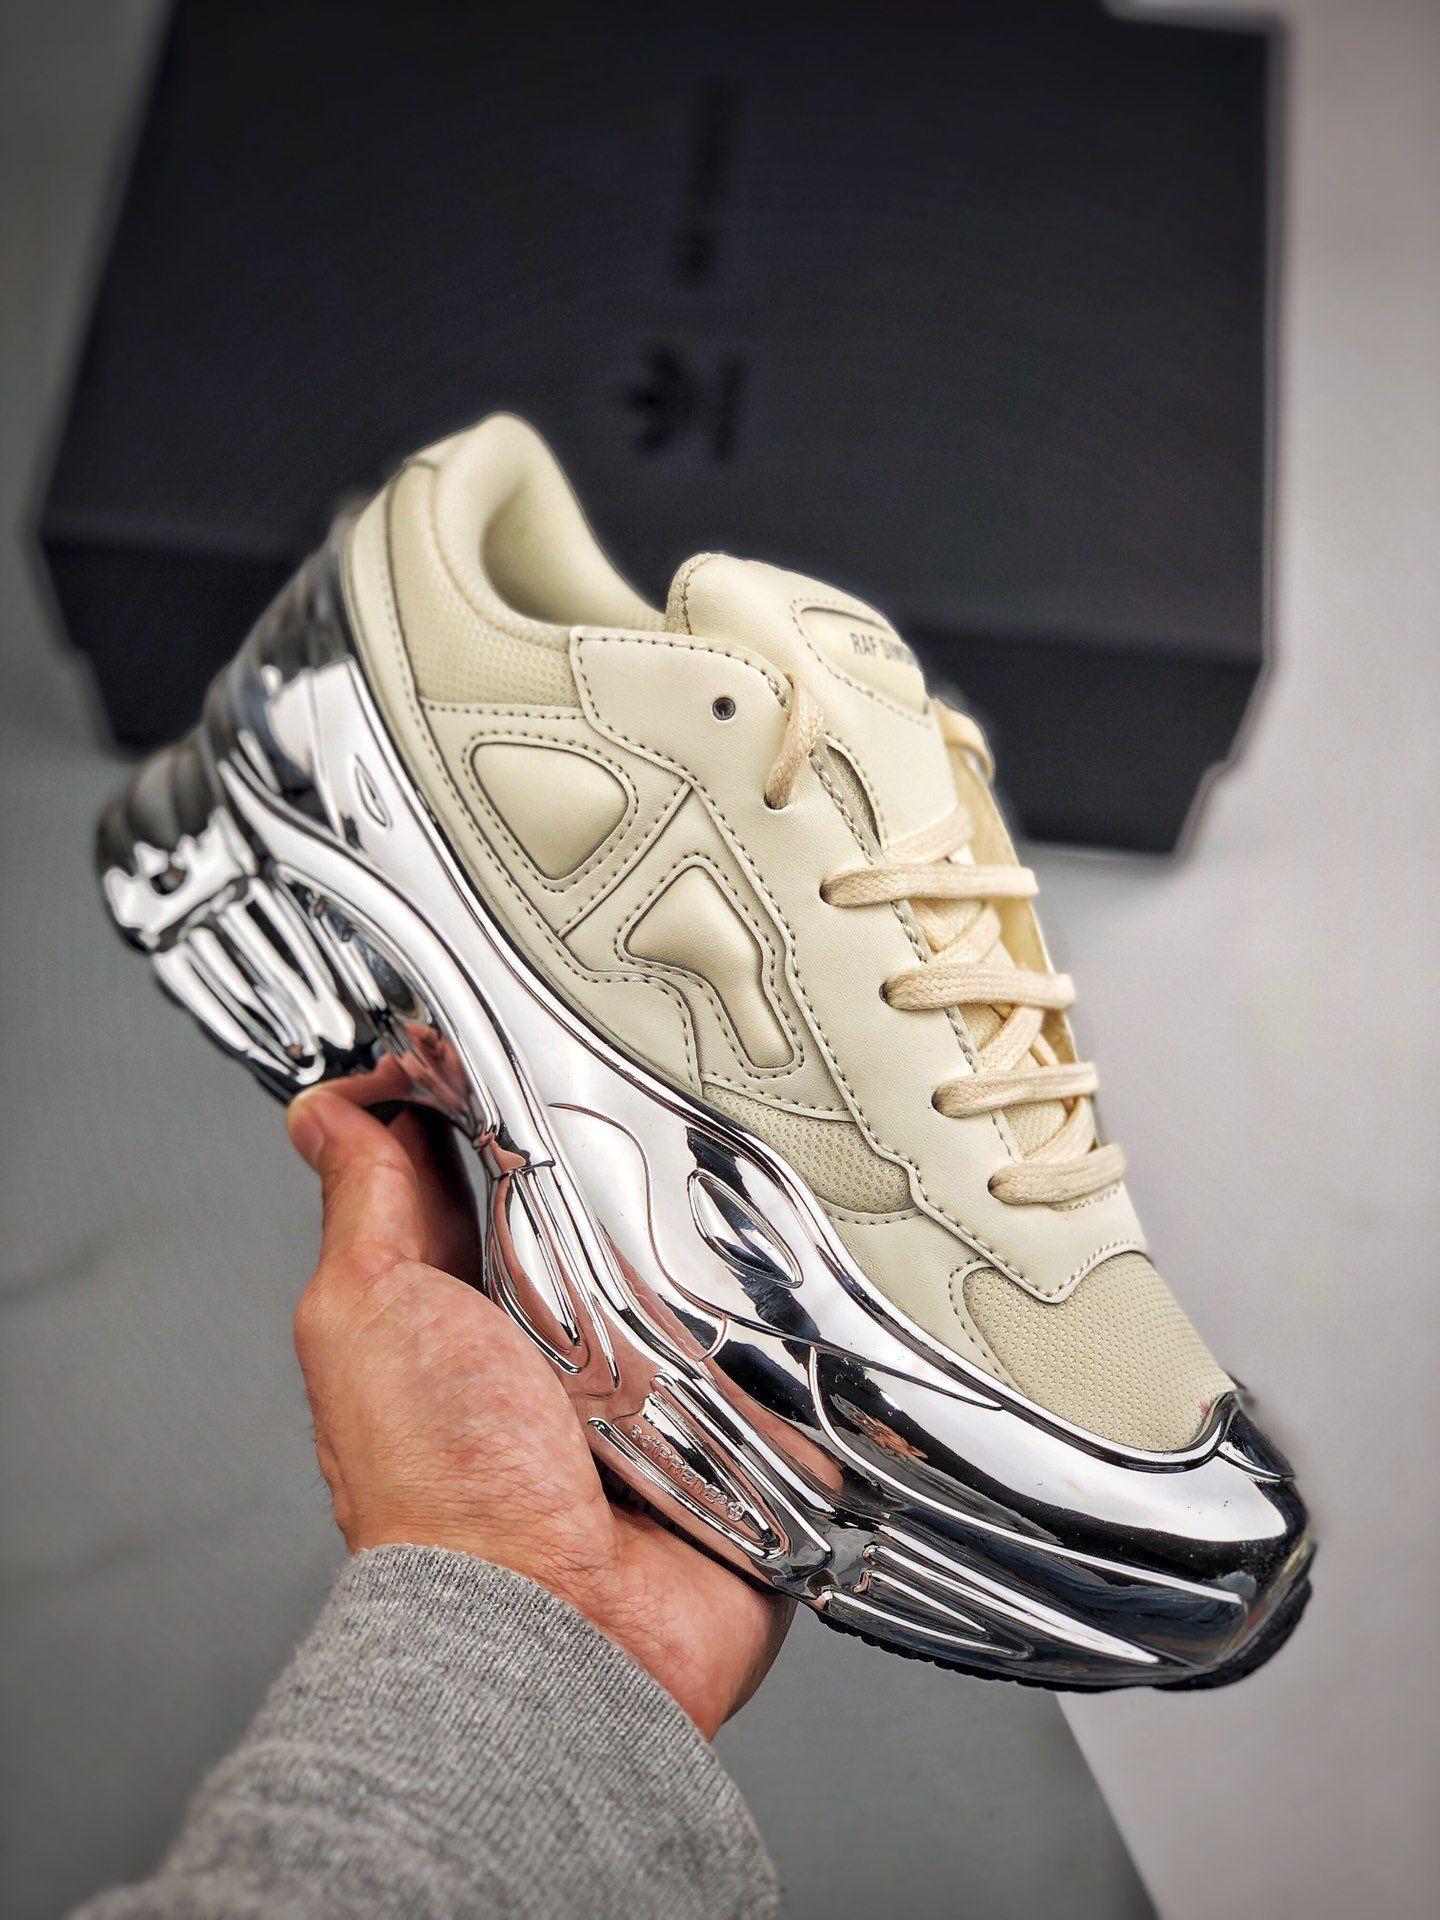 21+ Raf simons adidas shoes ideas ideas